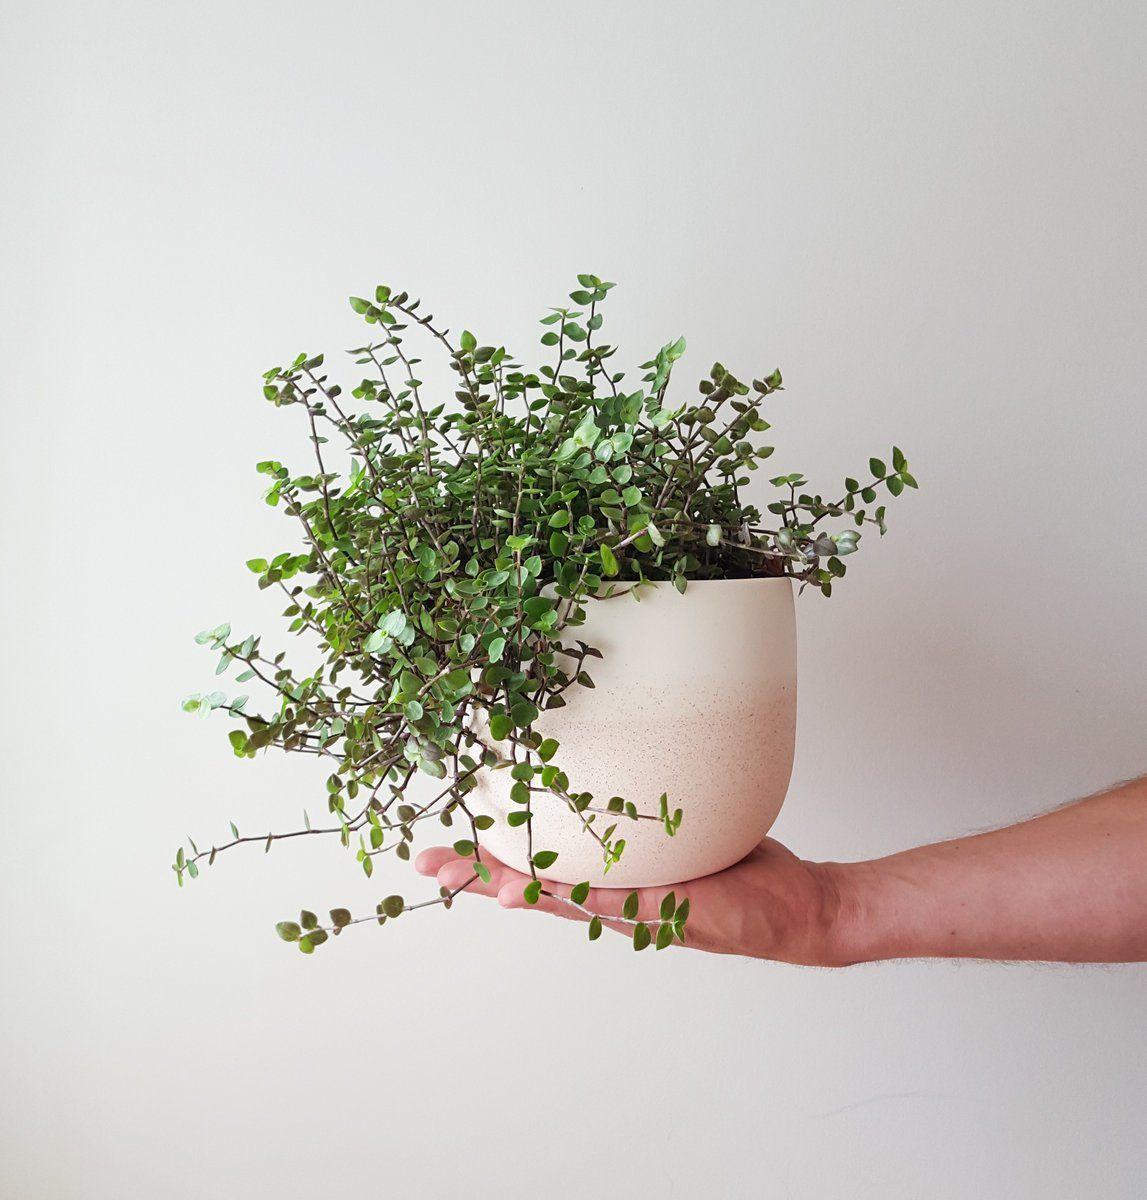 Coole Zimmerpflanzen callisia repens bubbles in reneé boyd dusty pink pot cool indoor